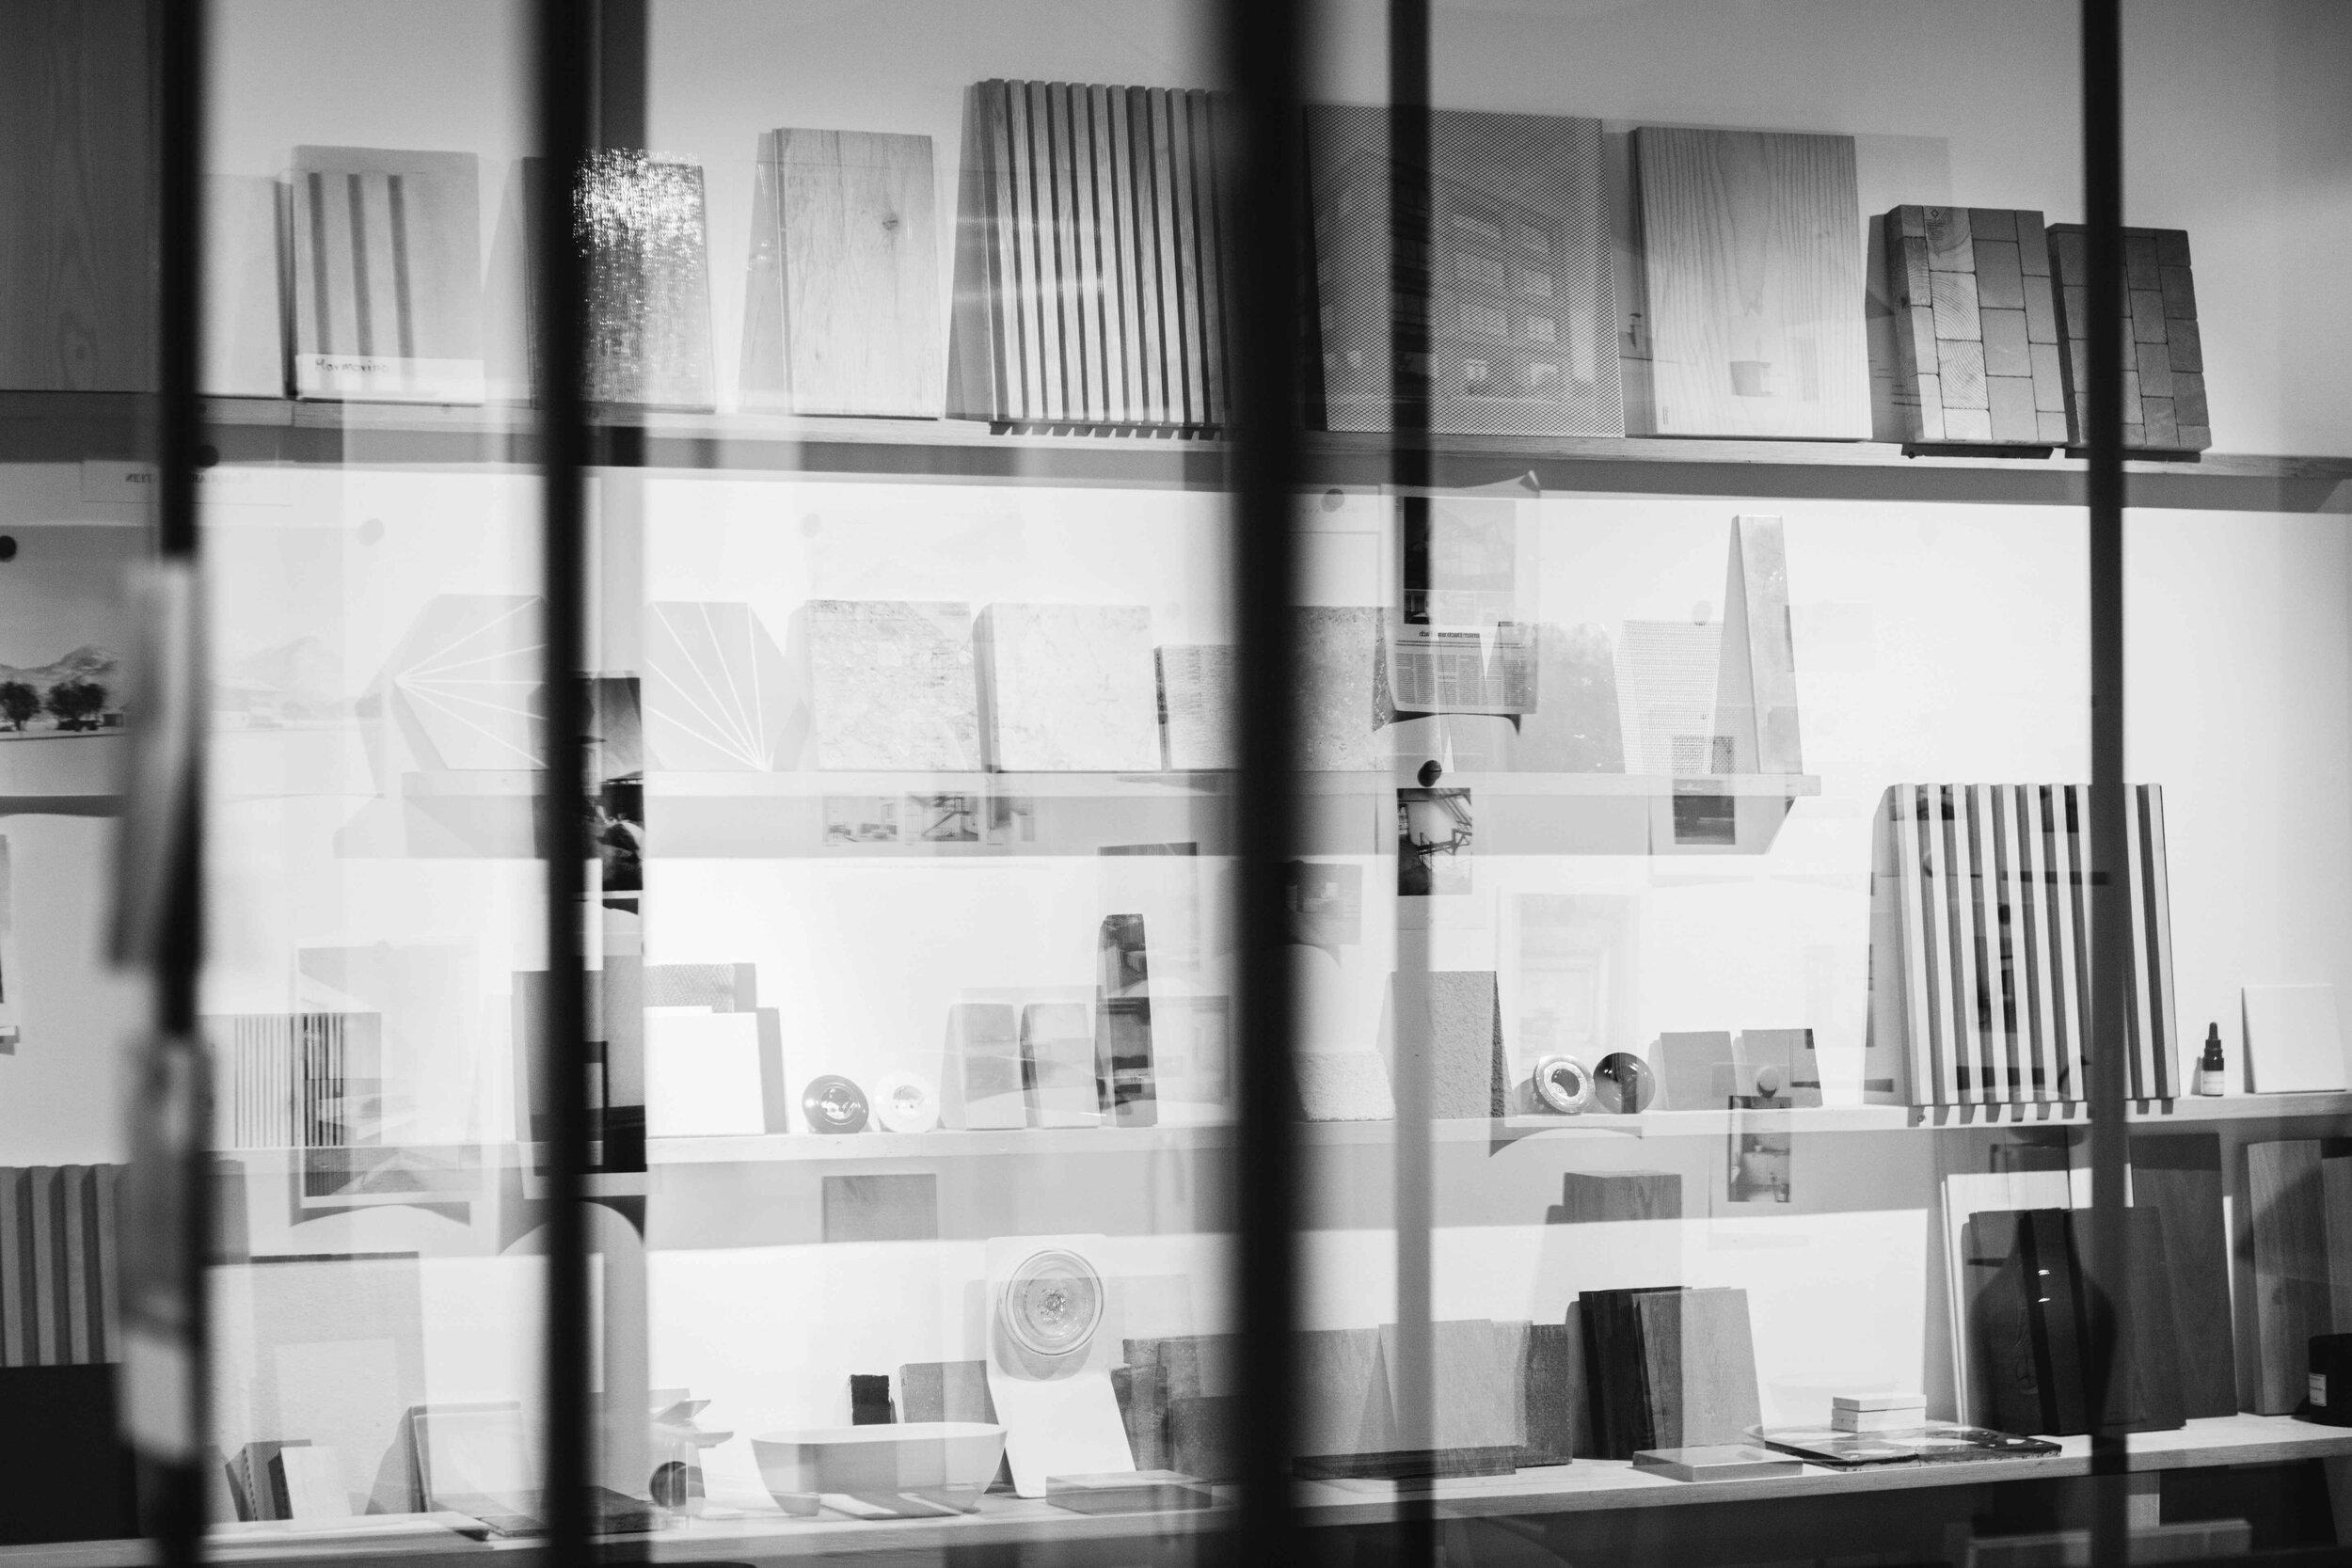 Architekturbuero-Philipp Moeller-München-Büro21.jpg